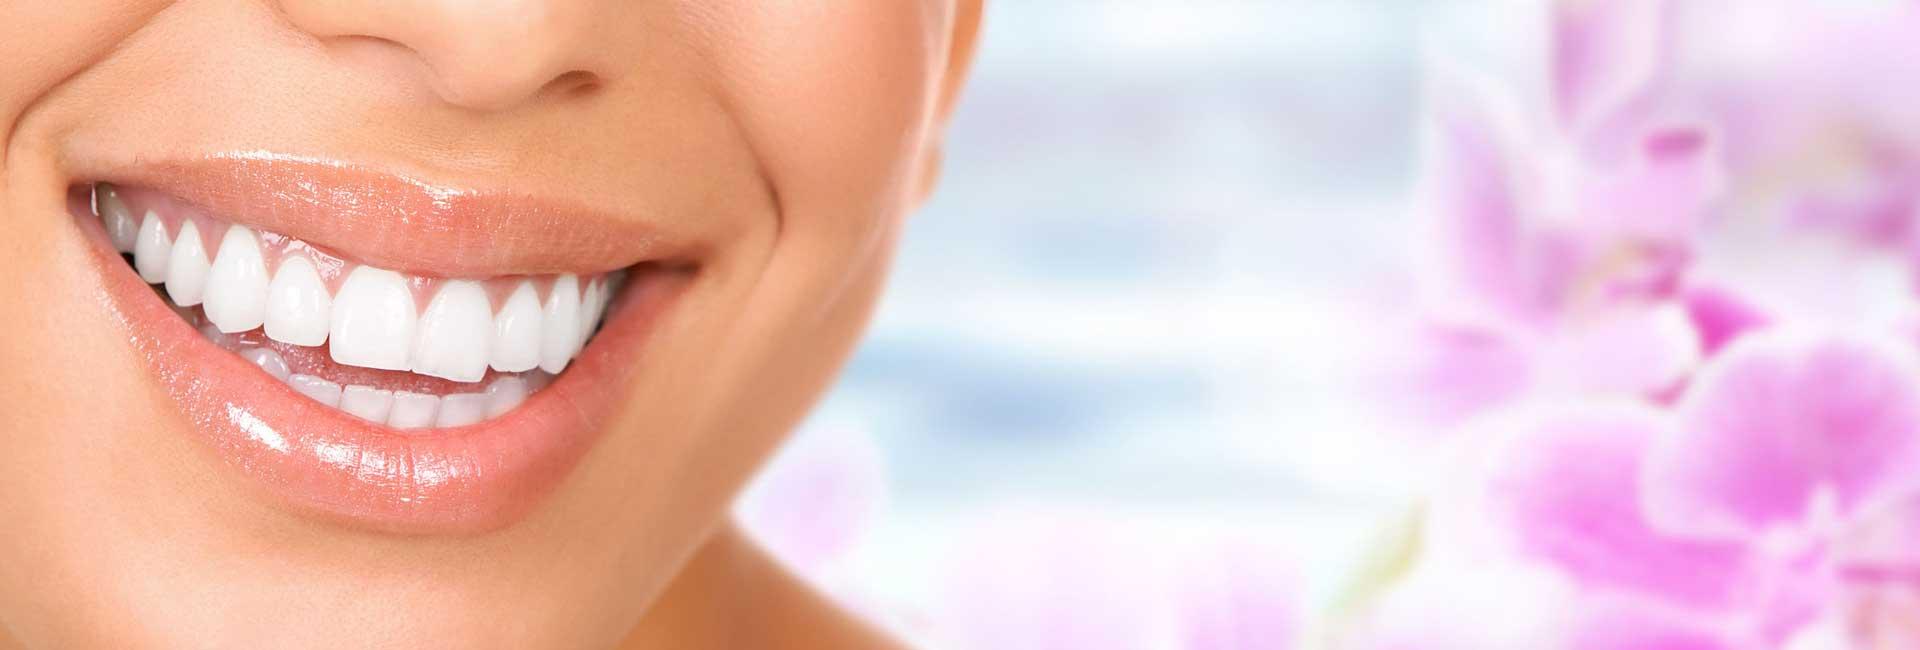 Zdravi zubi – LEP OSMEH!